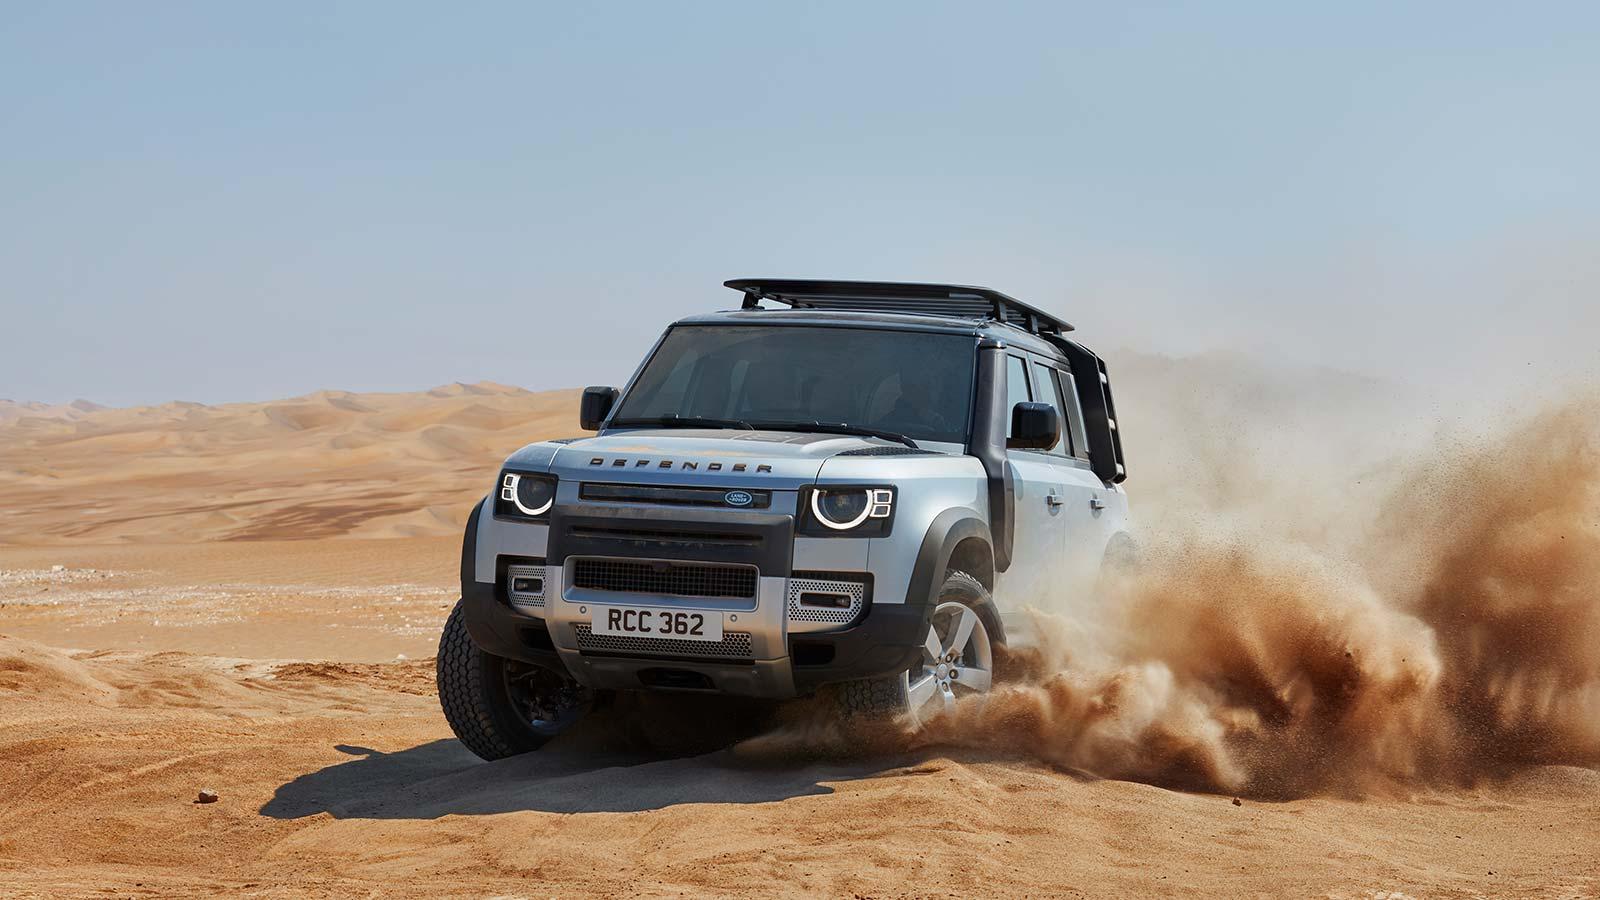 Land Rover Defender Suv On Dirt